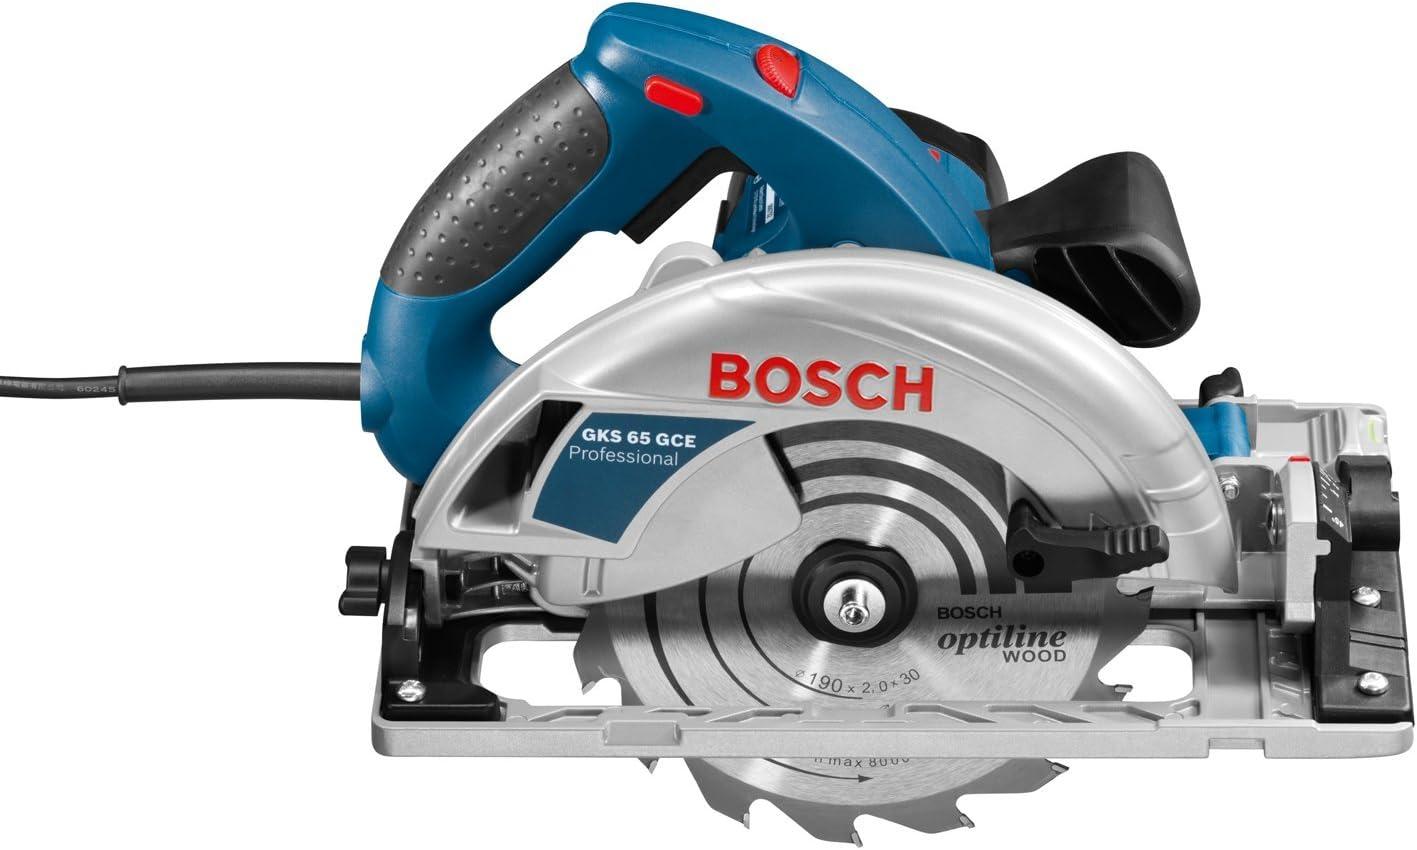 1800 W, /Ø Disco 190 mm, velocidad variable, carril gu/ía, en L-BOXX Sierra circular Bosch Professional GKS 65 GCE